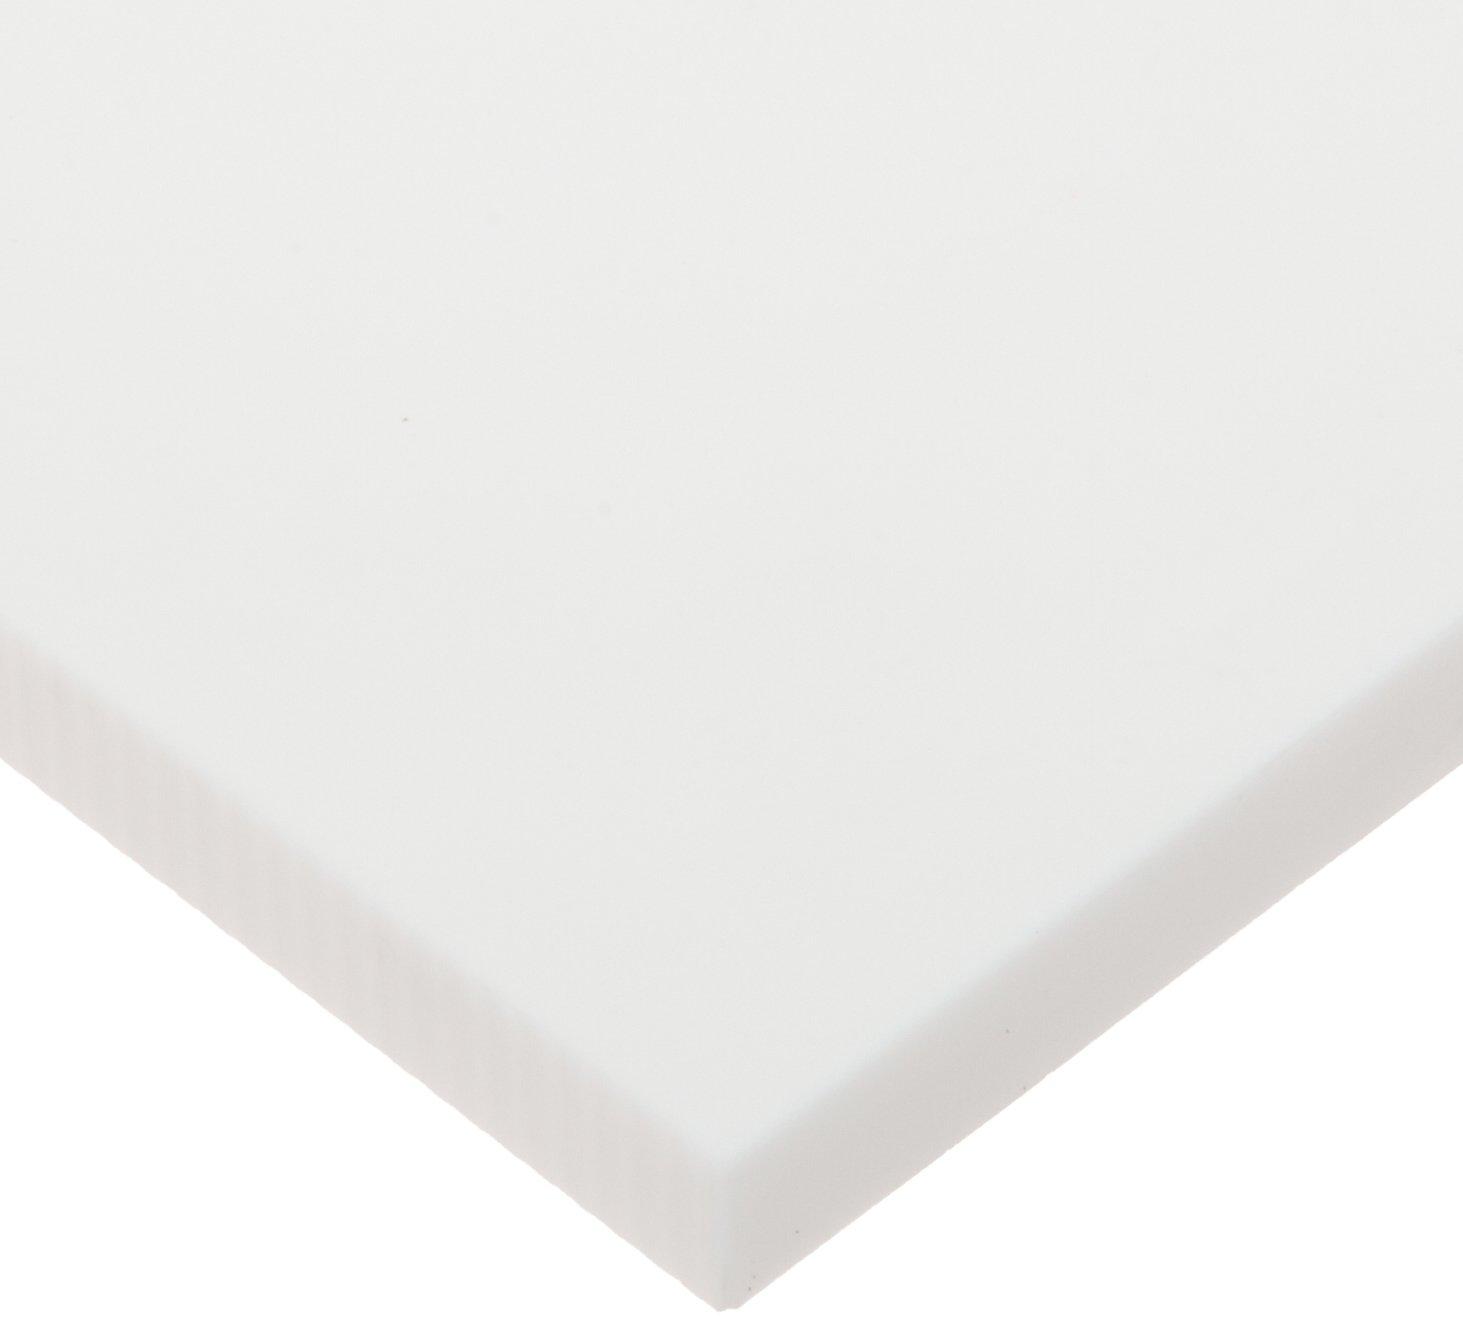 Glass-Mica Ceramic Sheet, Opaque White, Inch